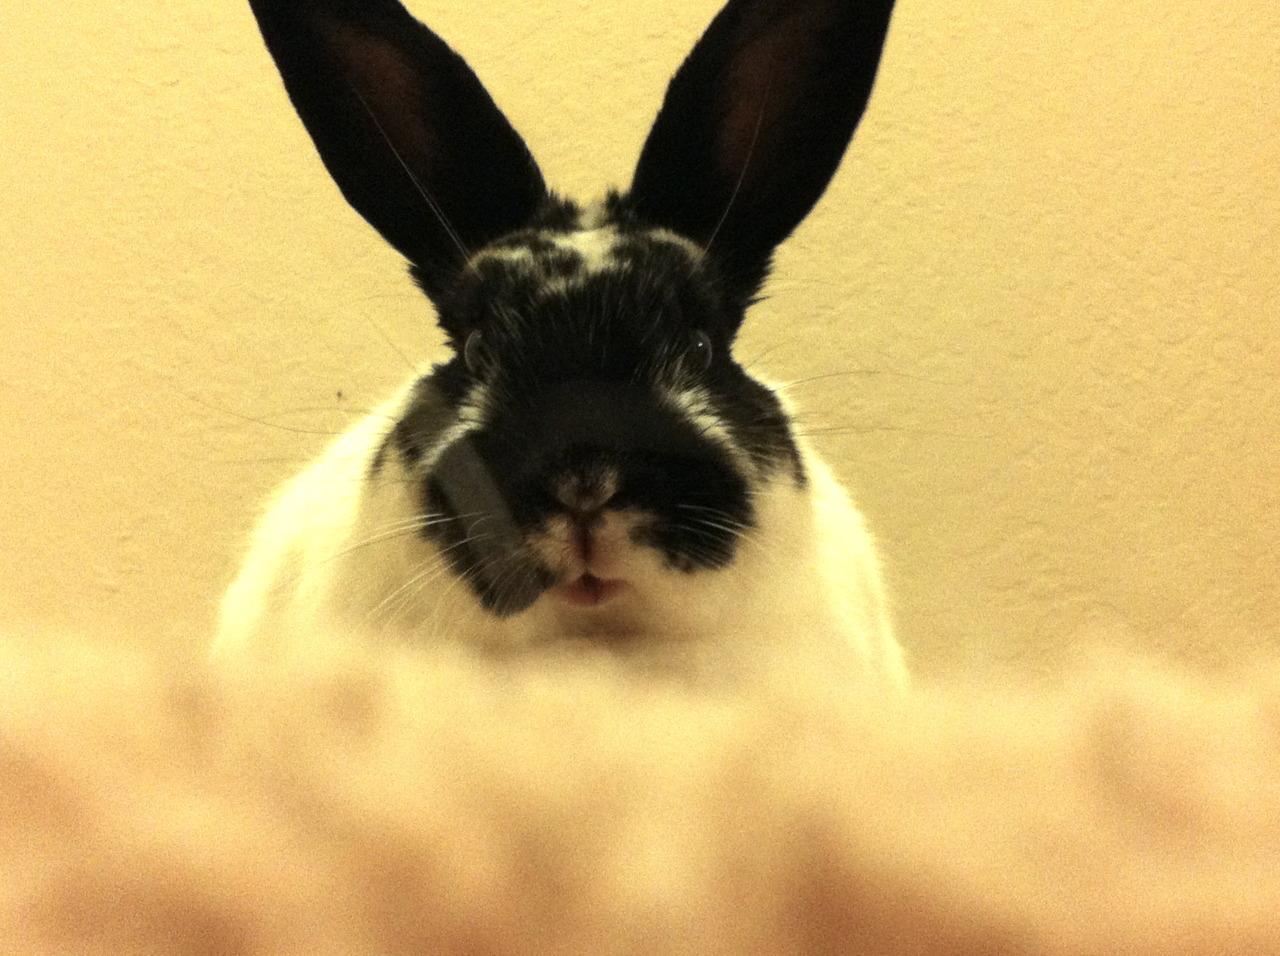 Bunny Plays Peek-a-Boo 2